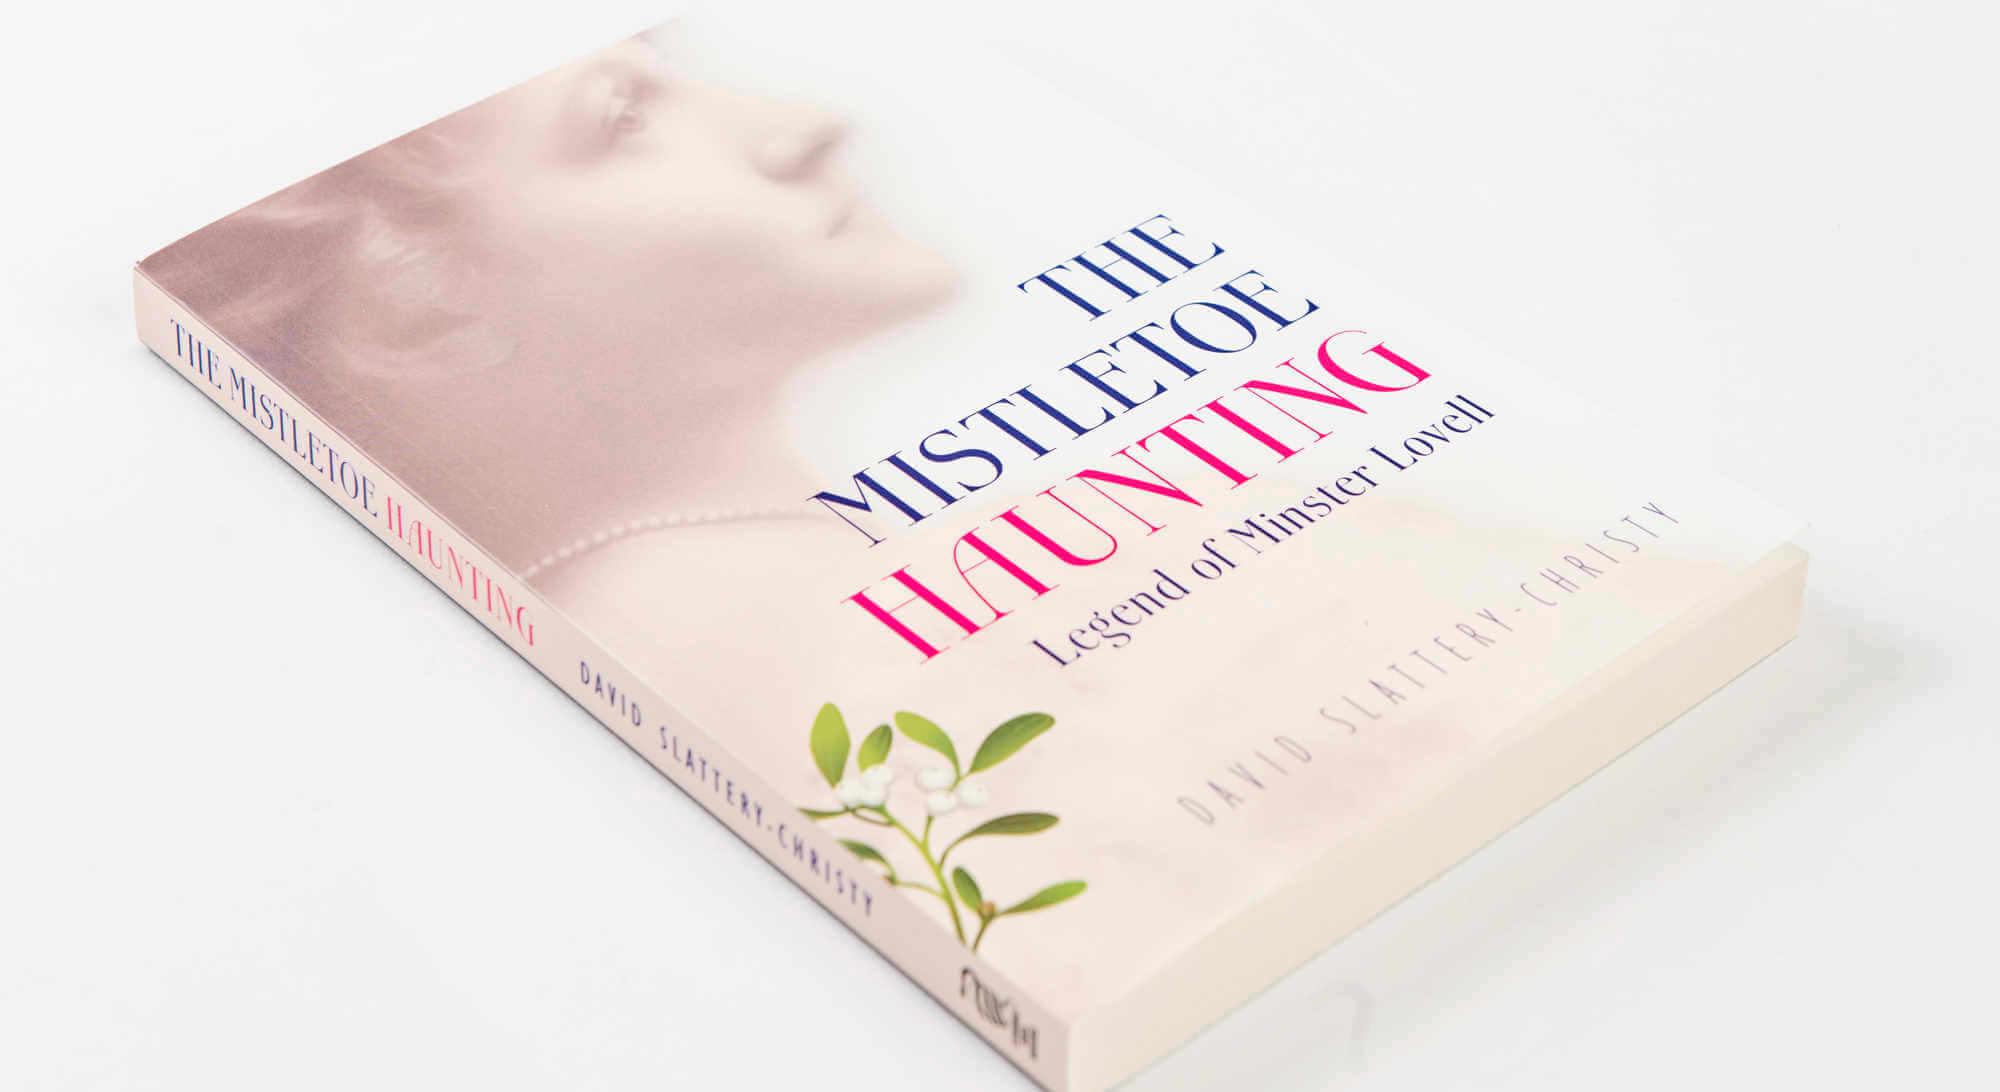 book-cover-the-mistletoe-haunting